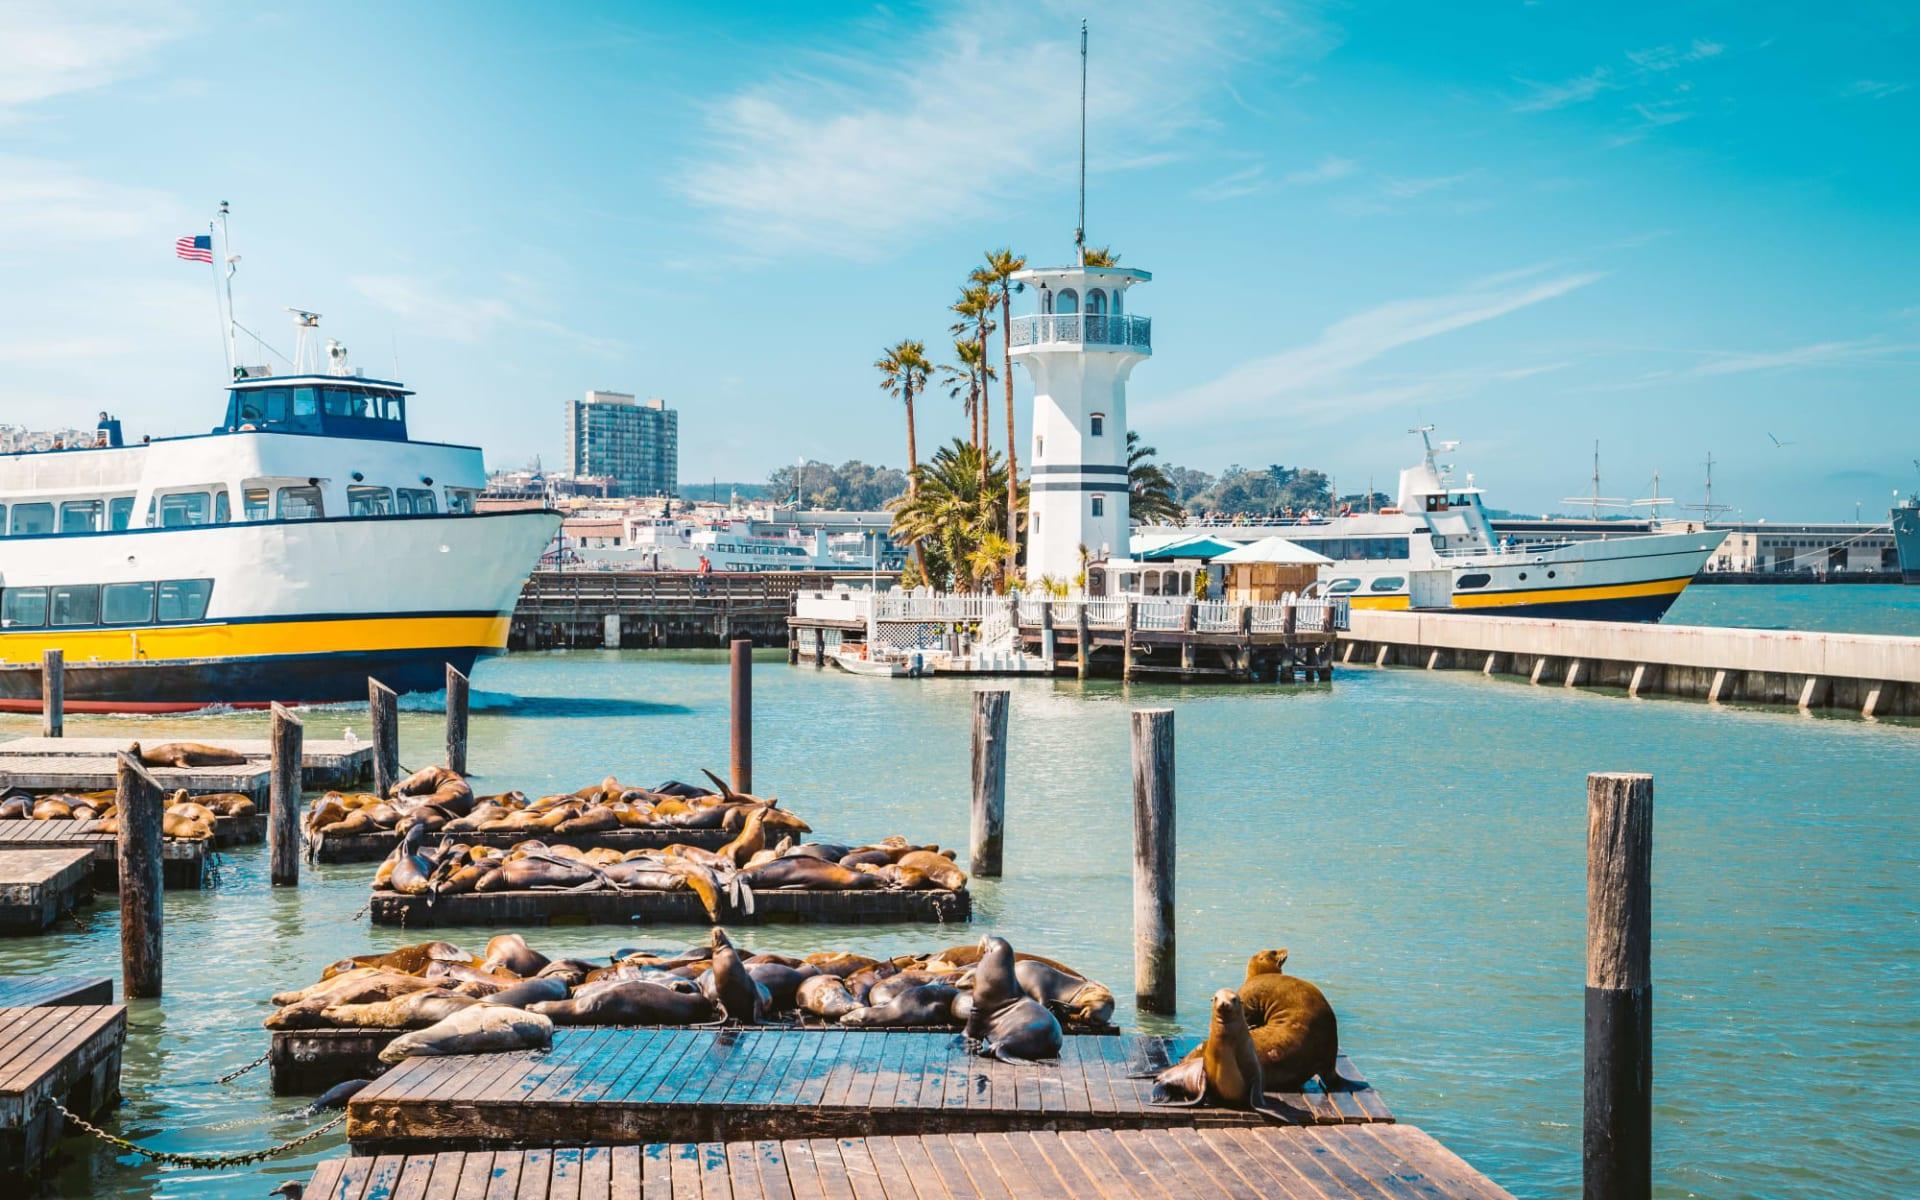 RIU Plaza Fisherman's Wharf in San Francisco: shutterstock_1396893035_sanfran7